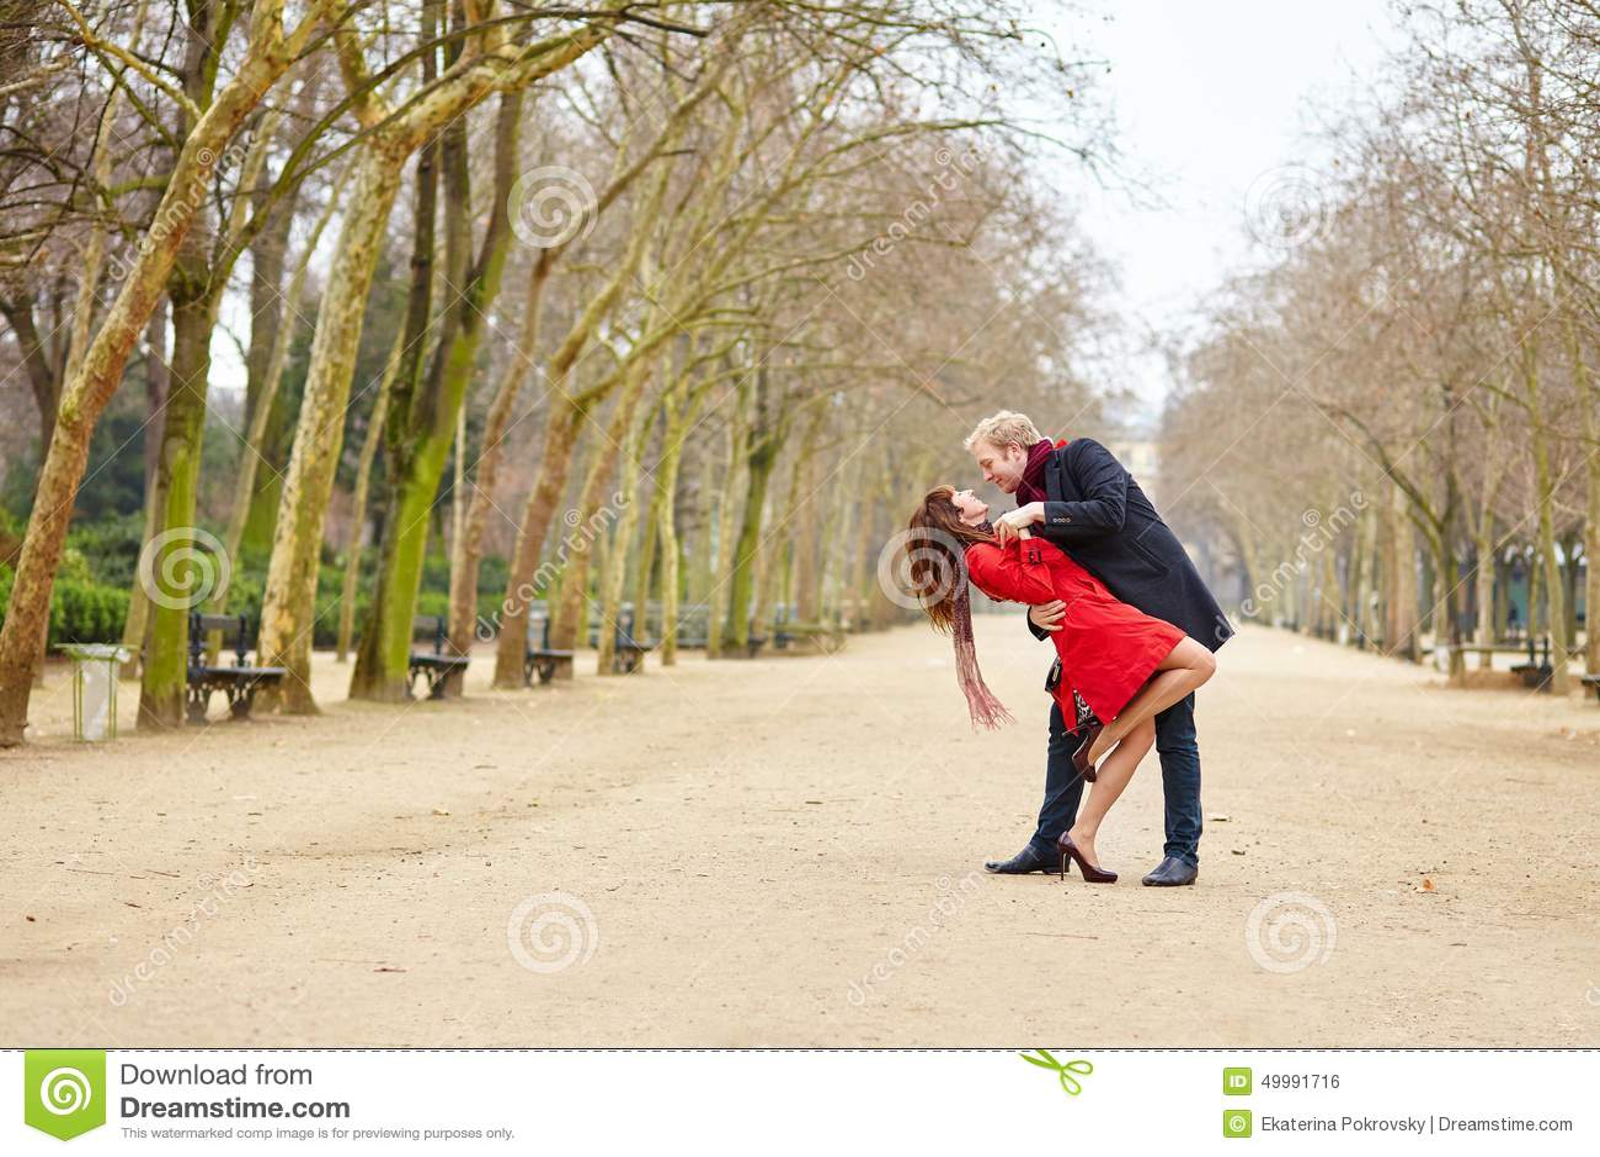 Couple dancing in the Luxembourg garden of Paris